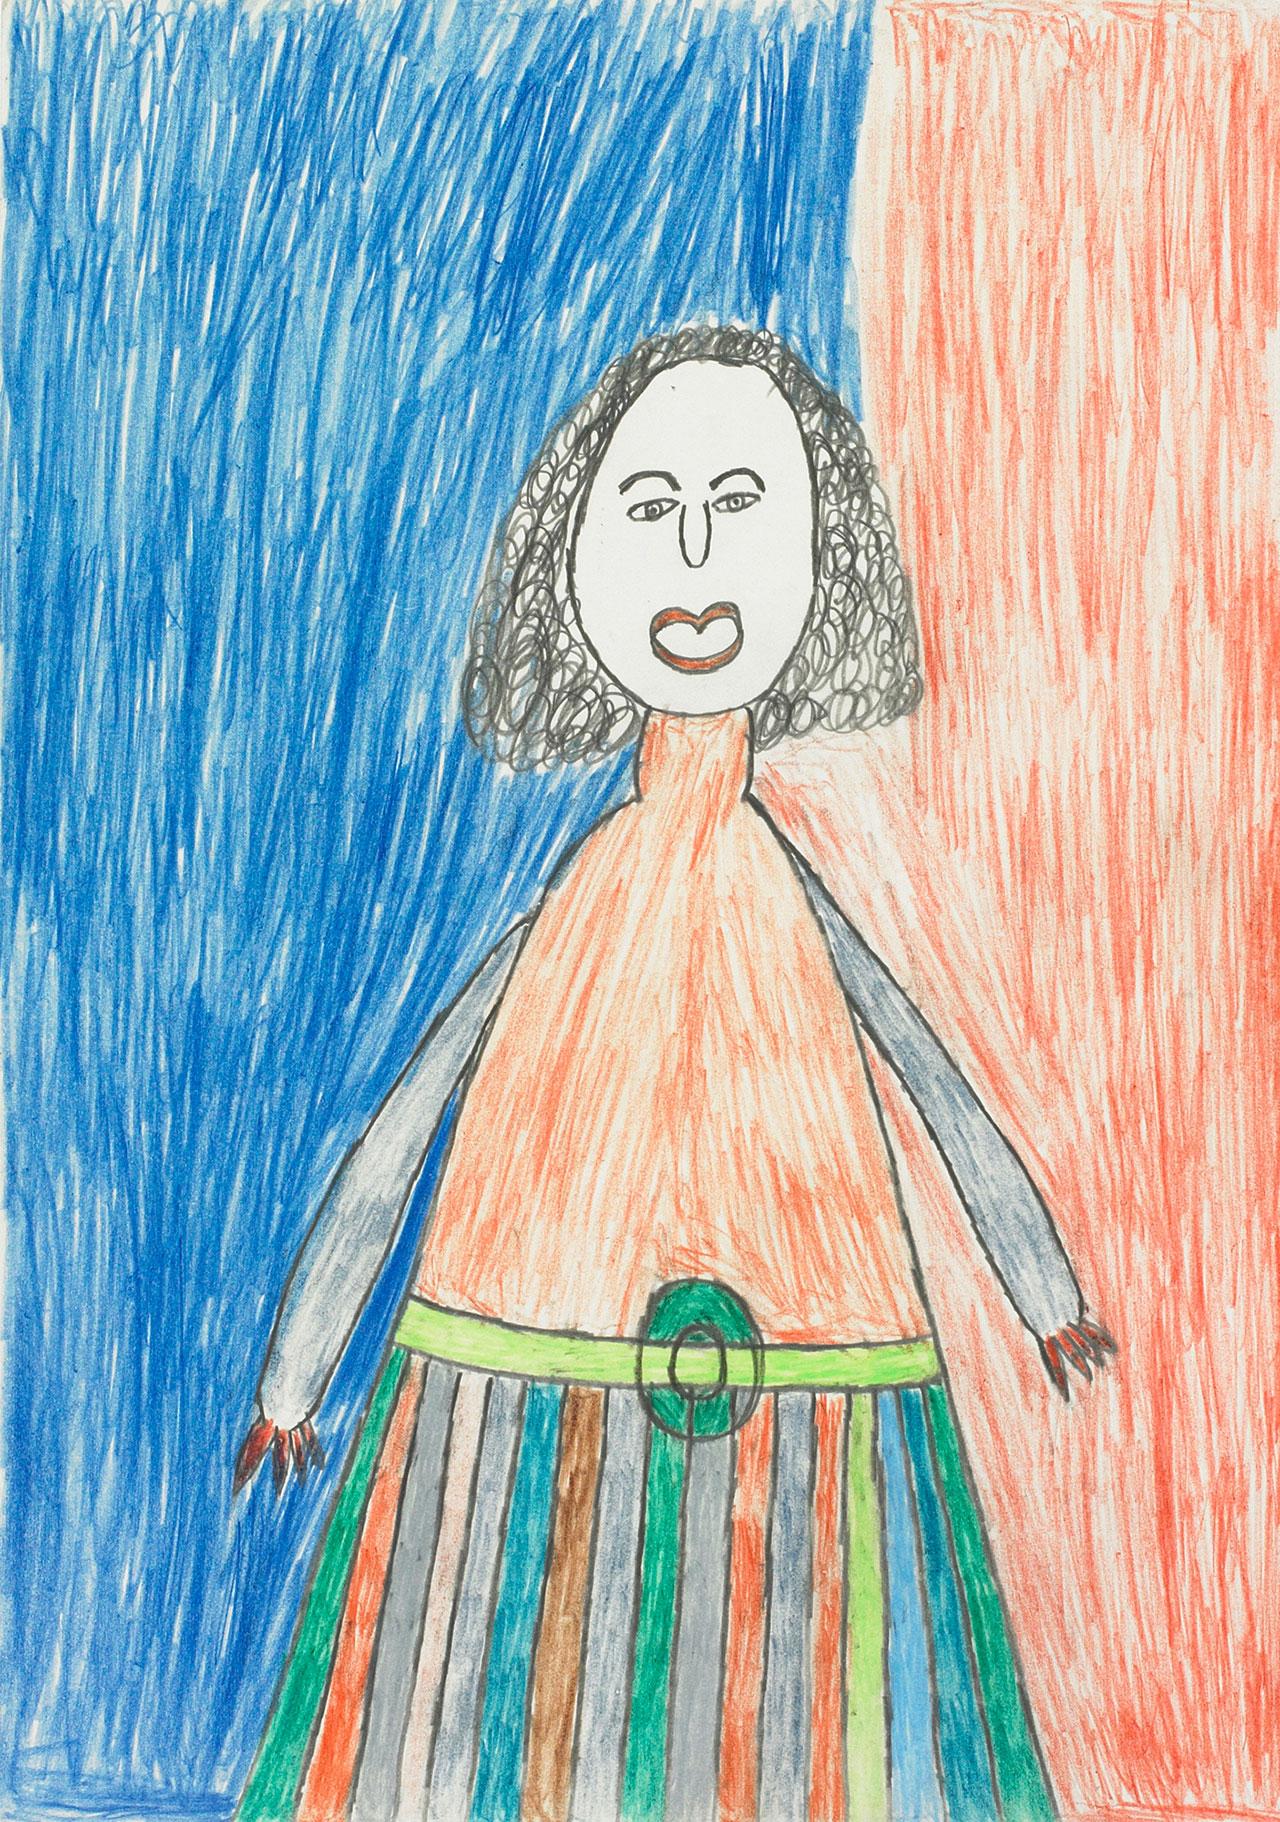 hauser johann - Frau / Woman